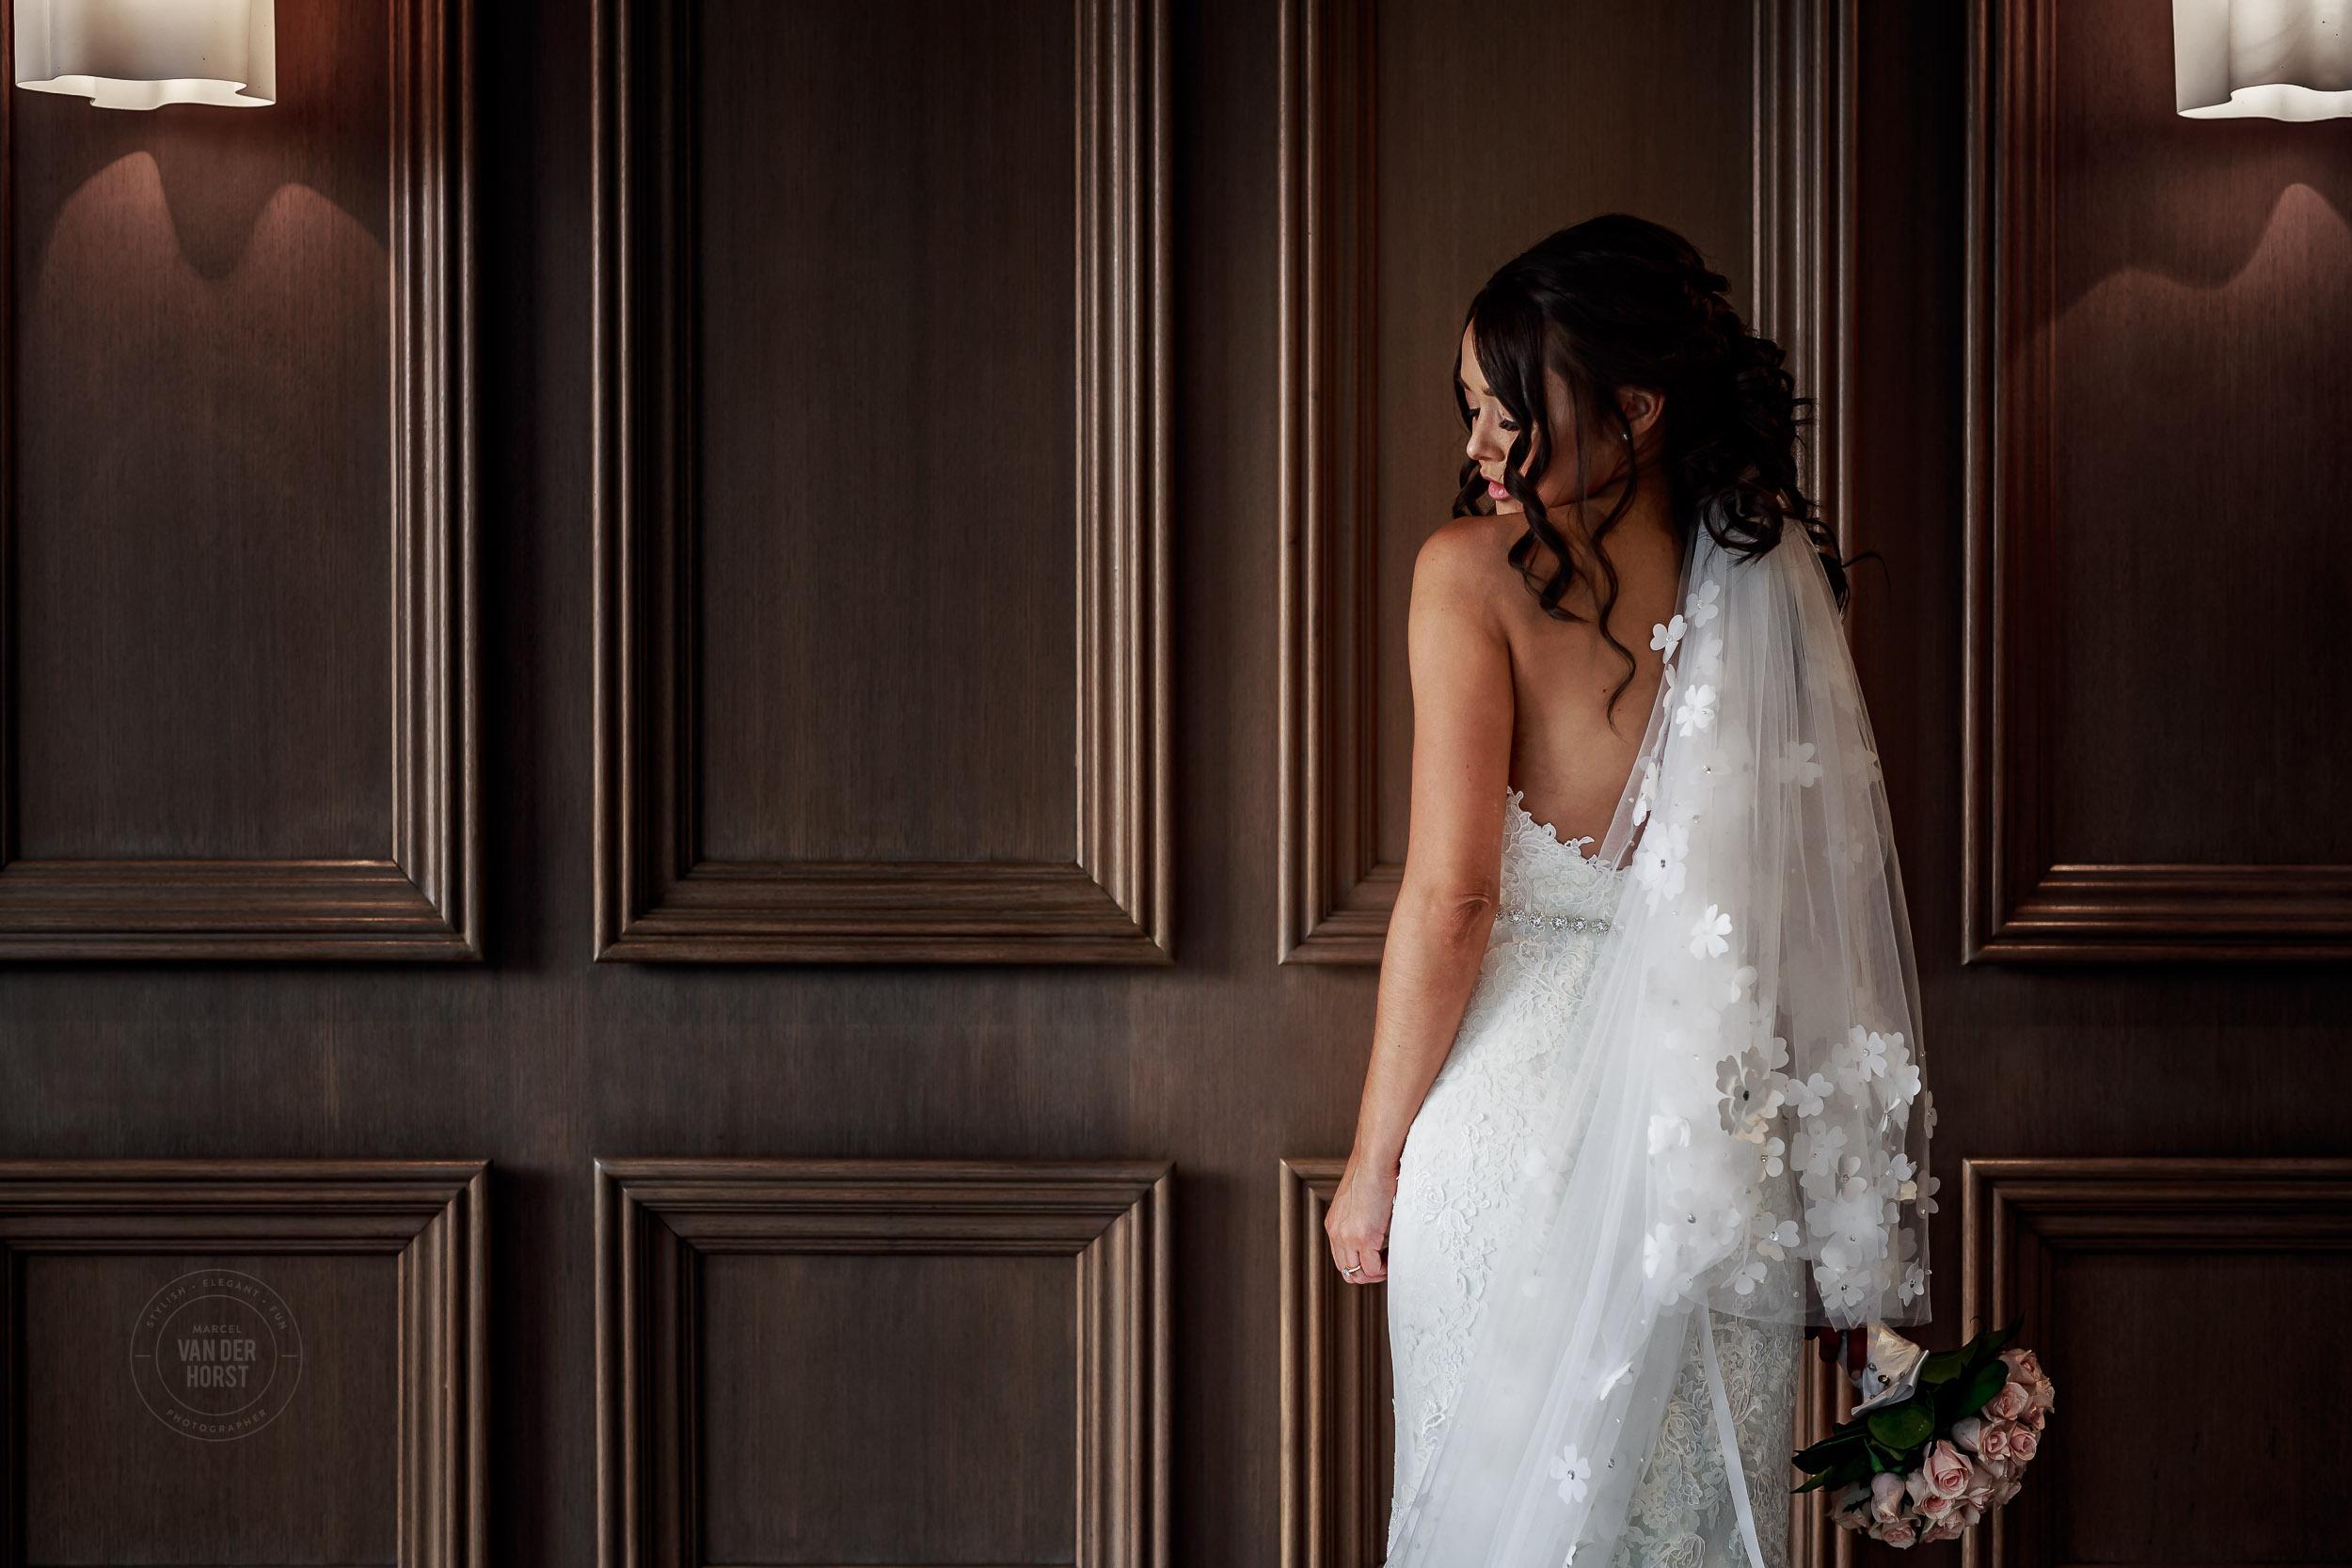 Melbourne-Wedding-Photographer-1018.jpg